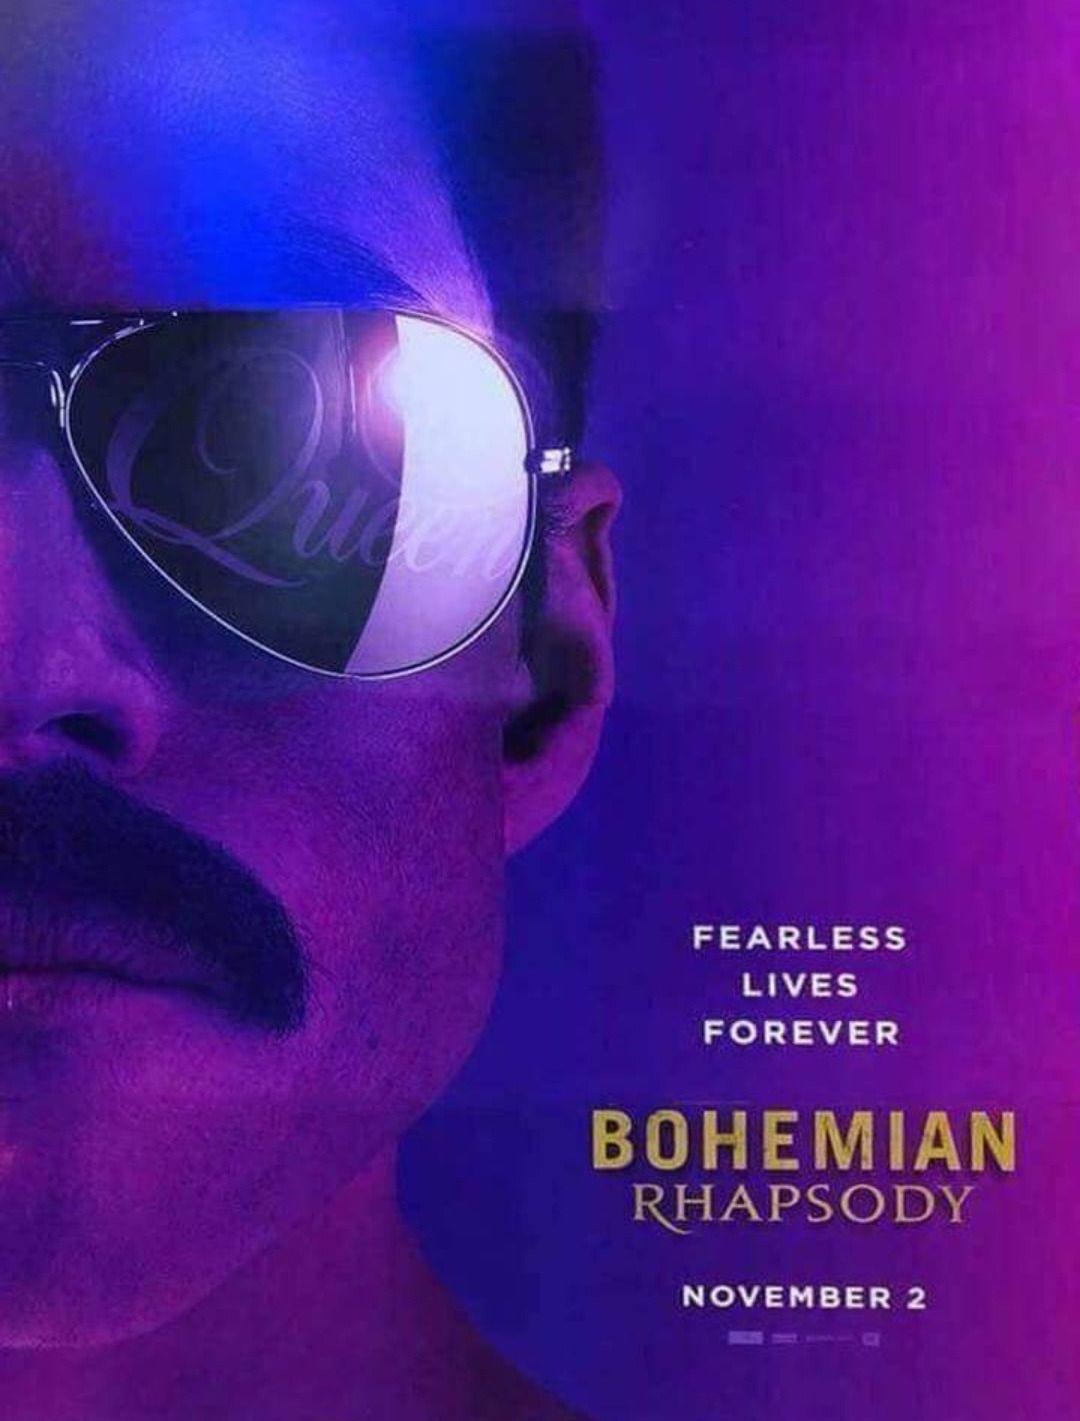 Bohemian Rhapsody - Bryan Singer, Dexter Fletcher